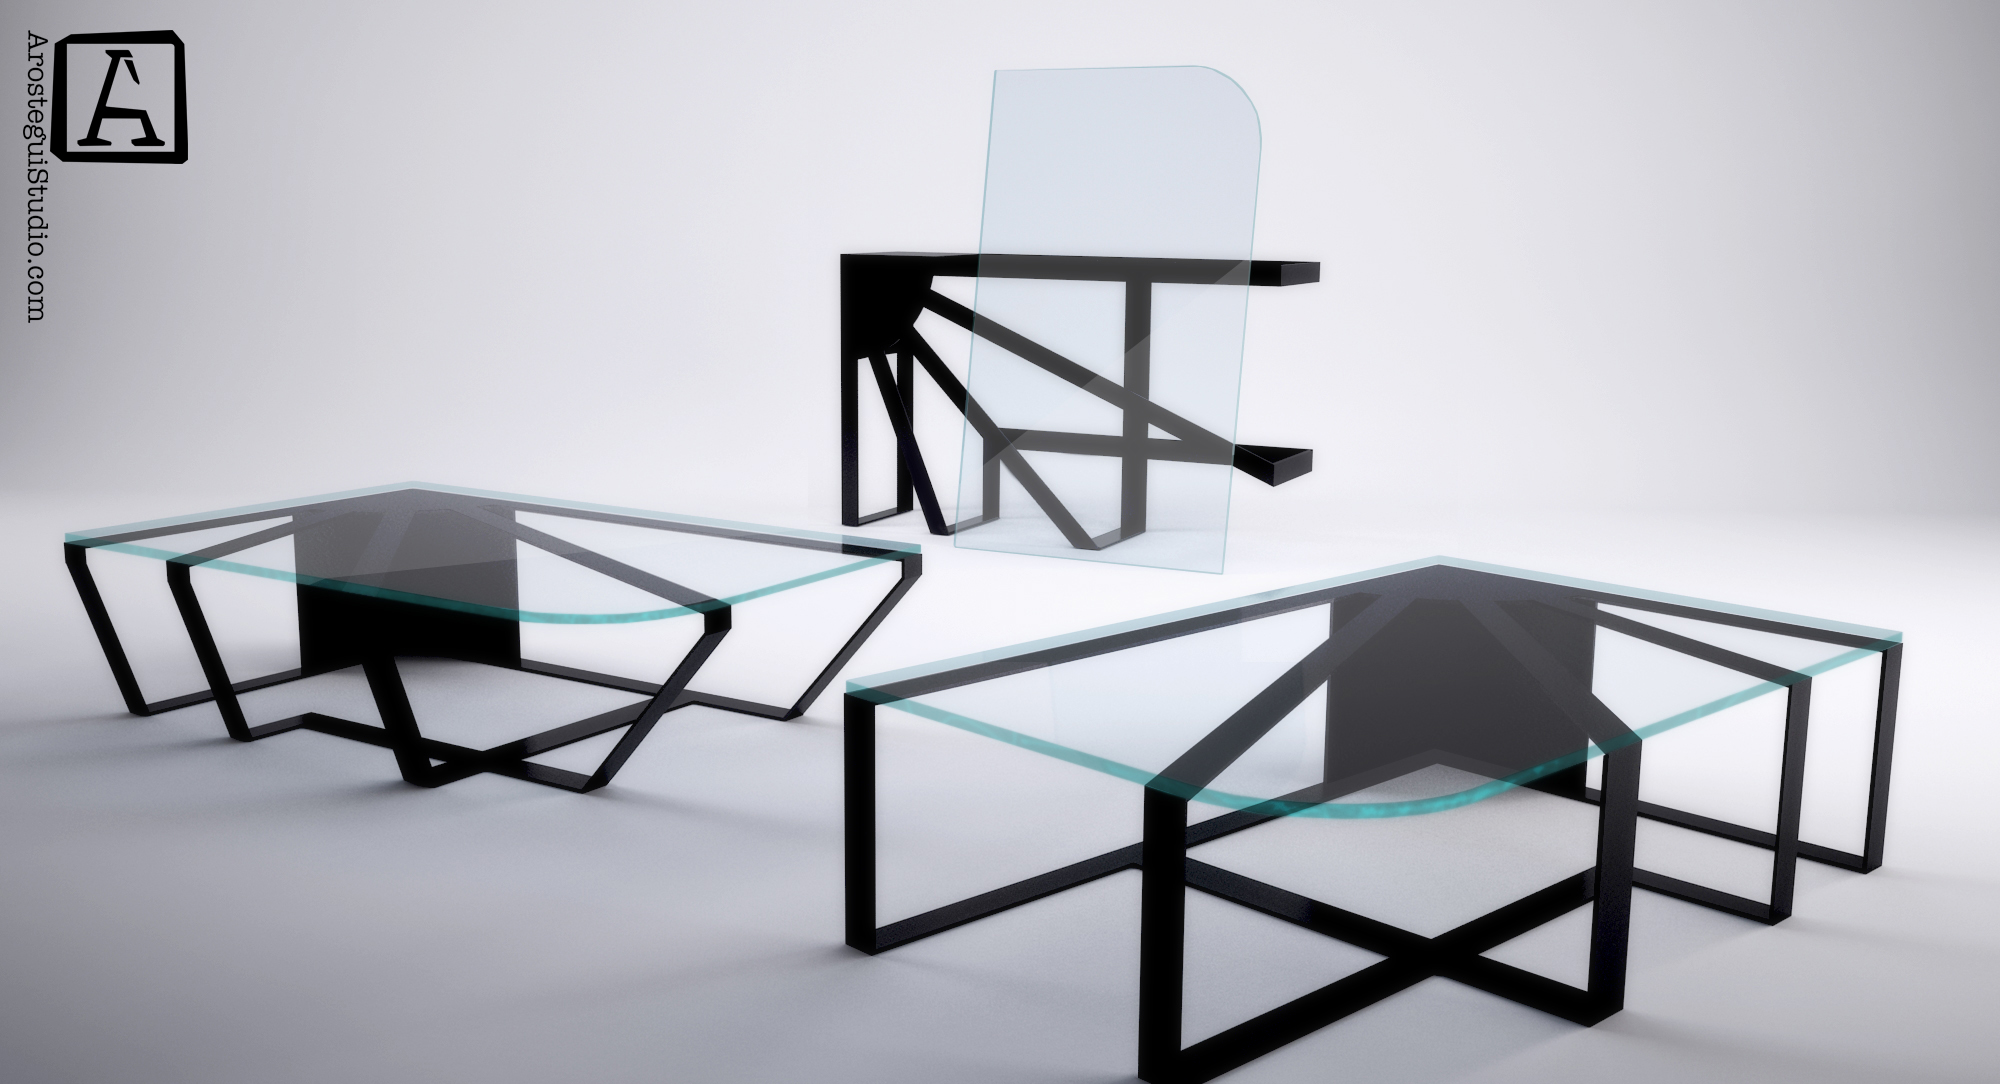 Solero coffee table- ©2017 Arostegui Studio